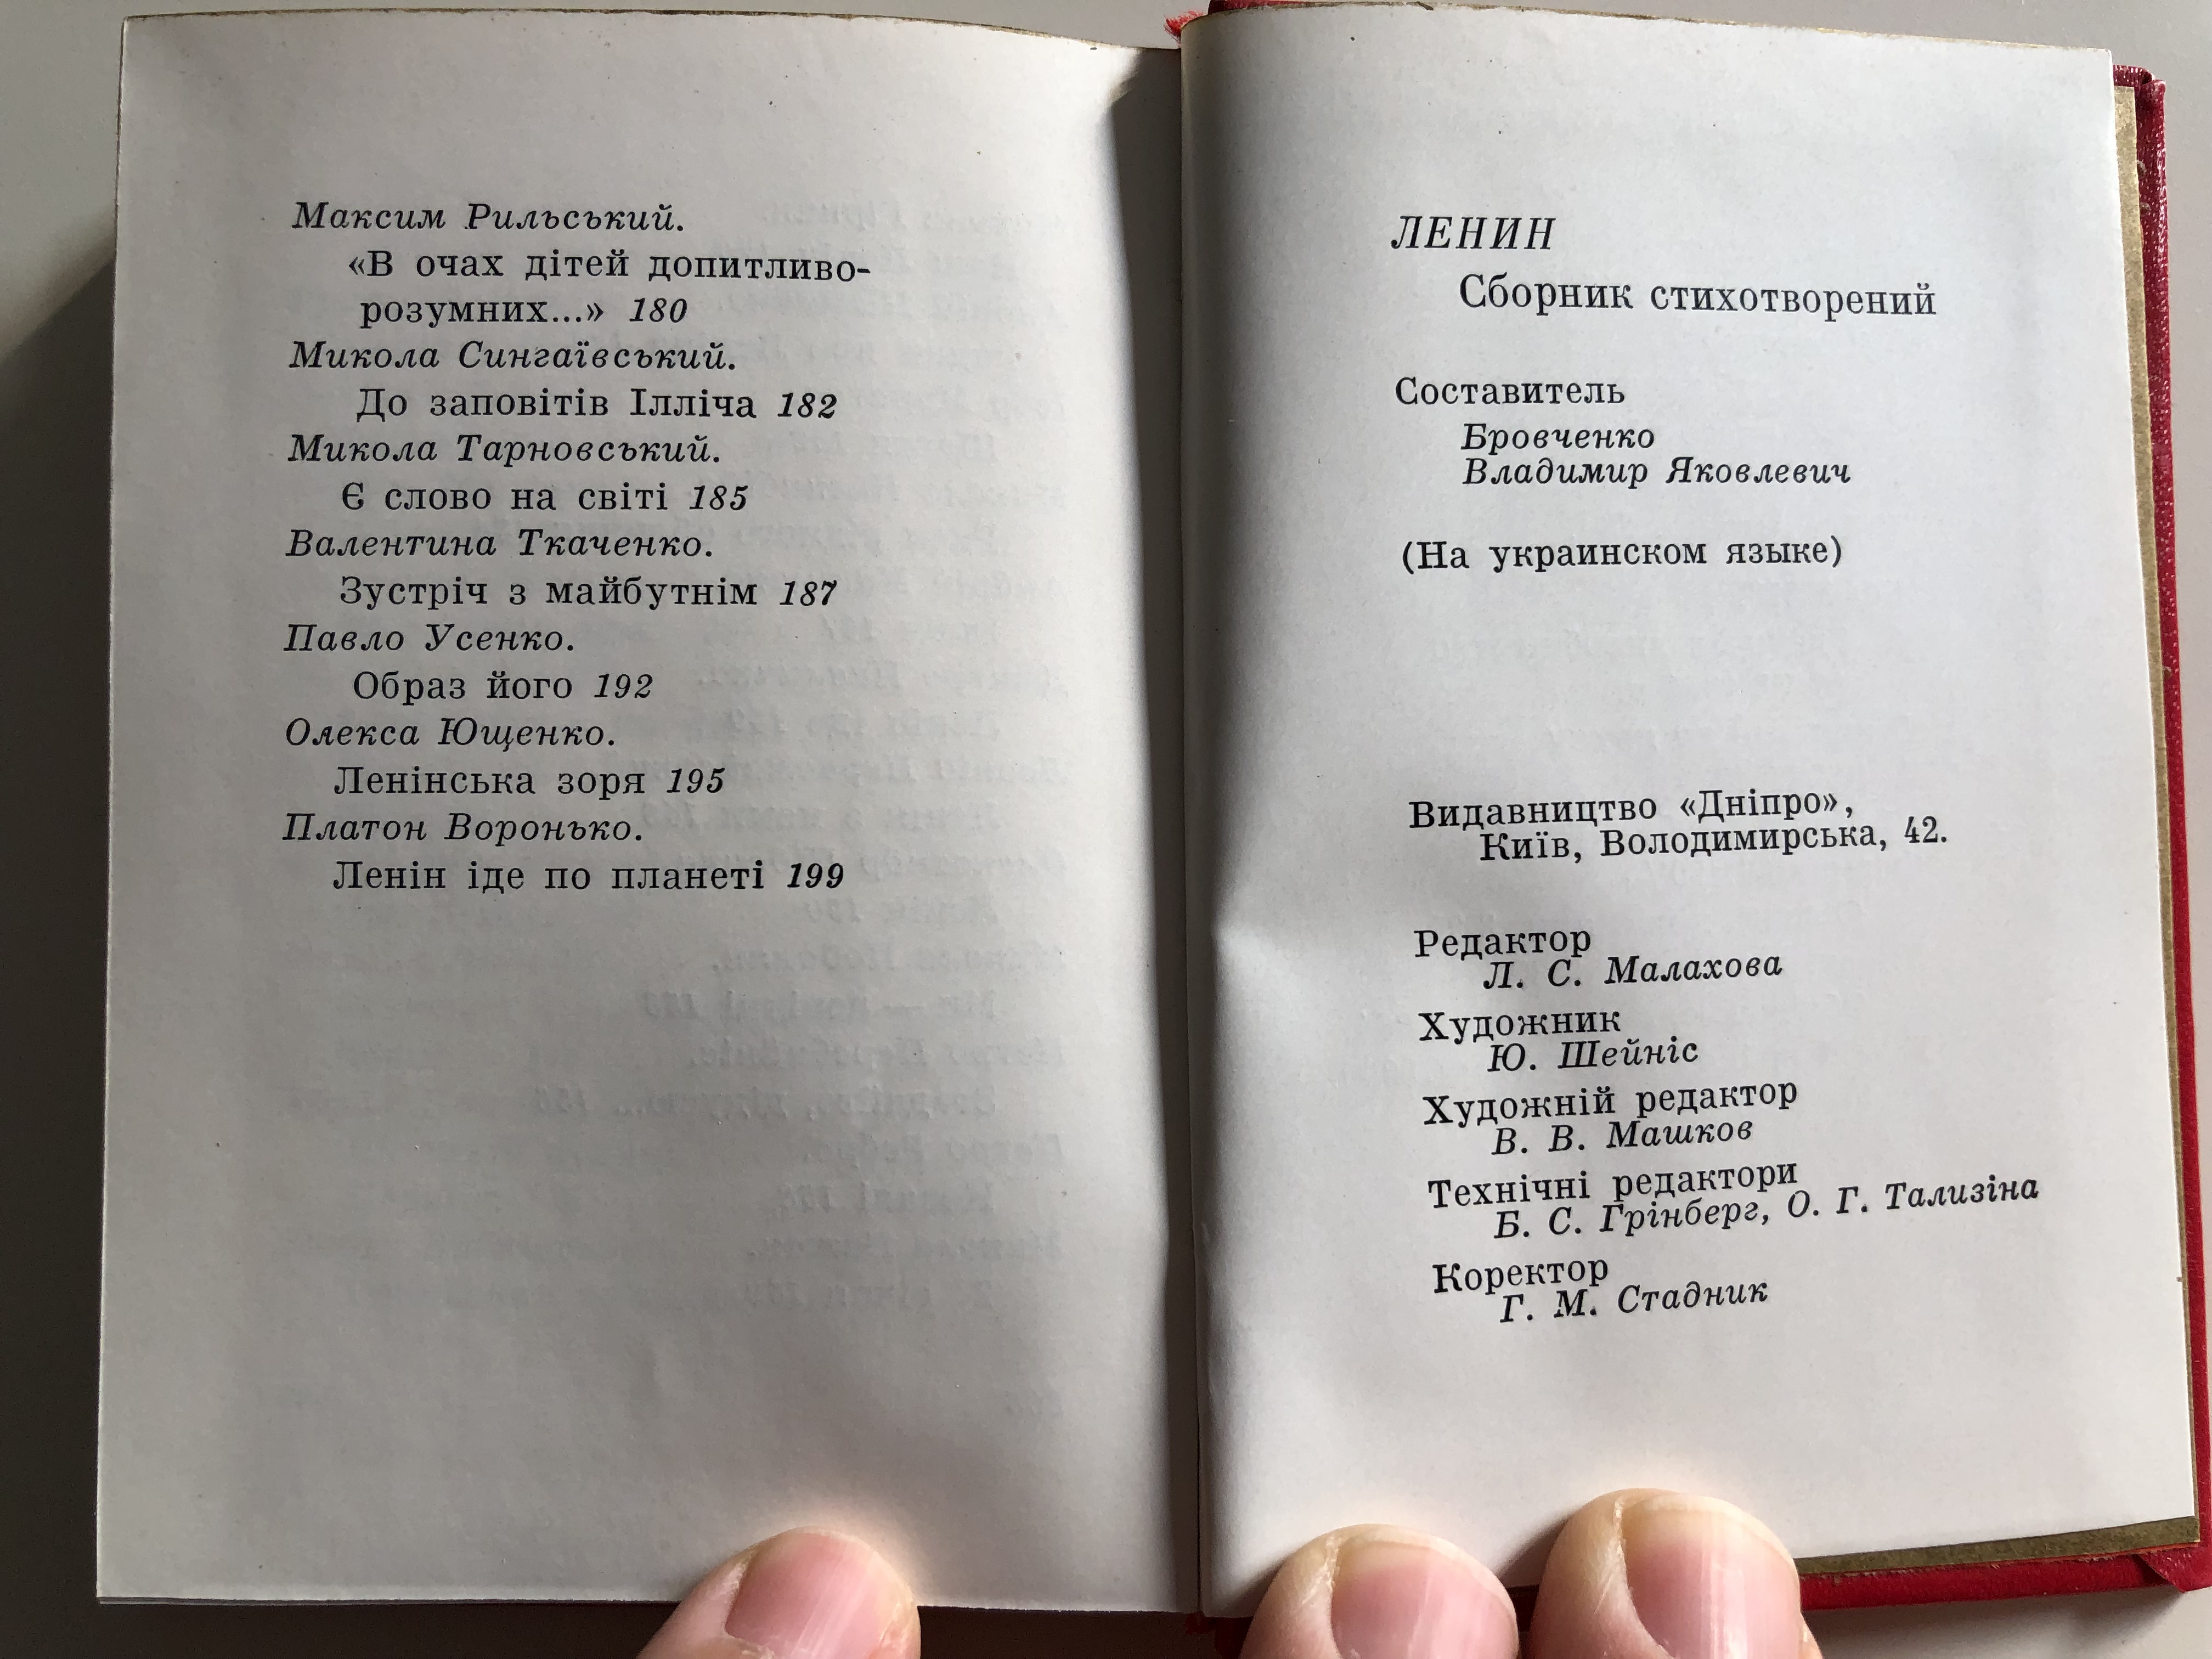 -ukrainian-language-poetry-by-soviet-authors-dedicated-to-lenin-hardcover-golden-edges-pocket-size-i-1975-13-.jpg